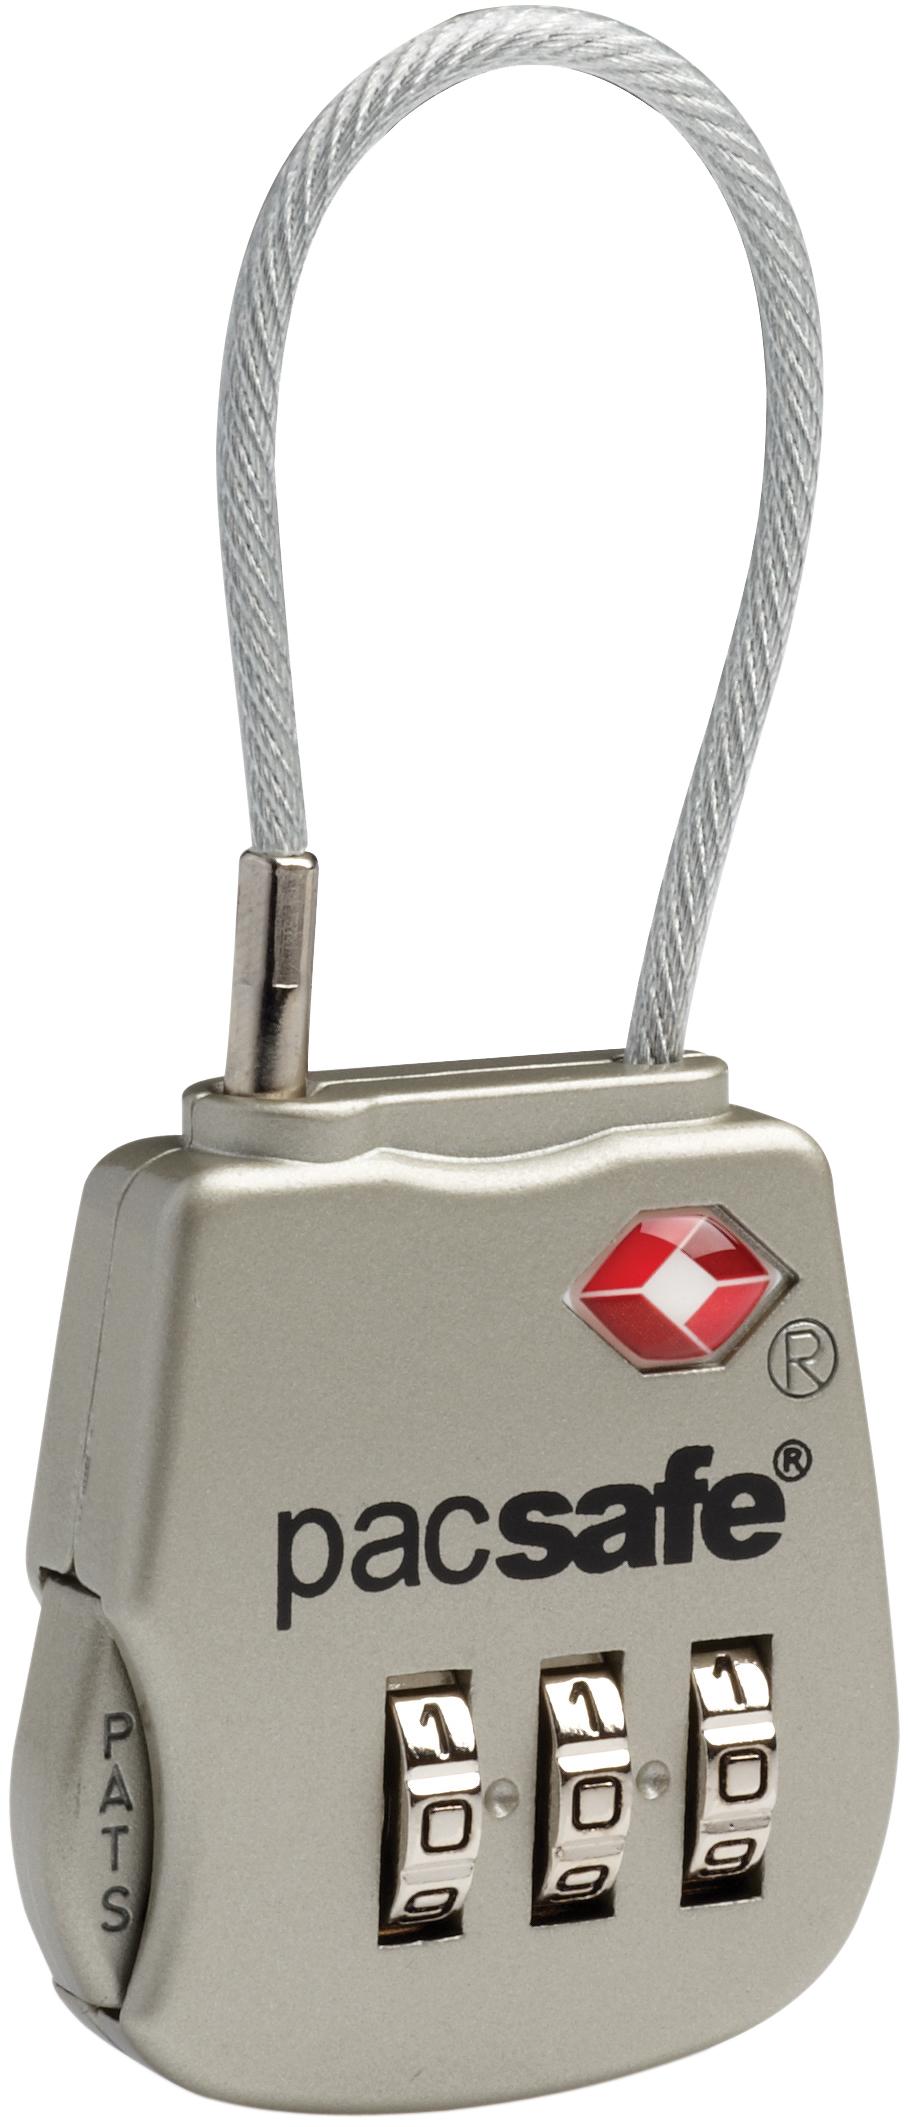 Locks Tags And Flags Security Zipper Lock Portable Mini Padlock For Bags